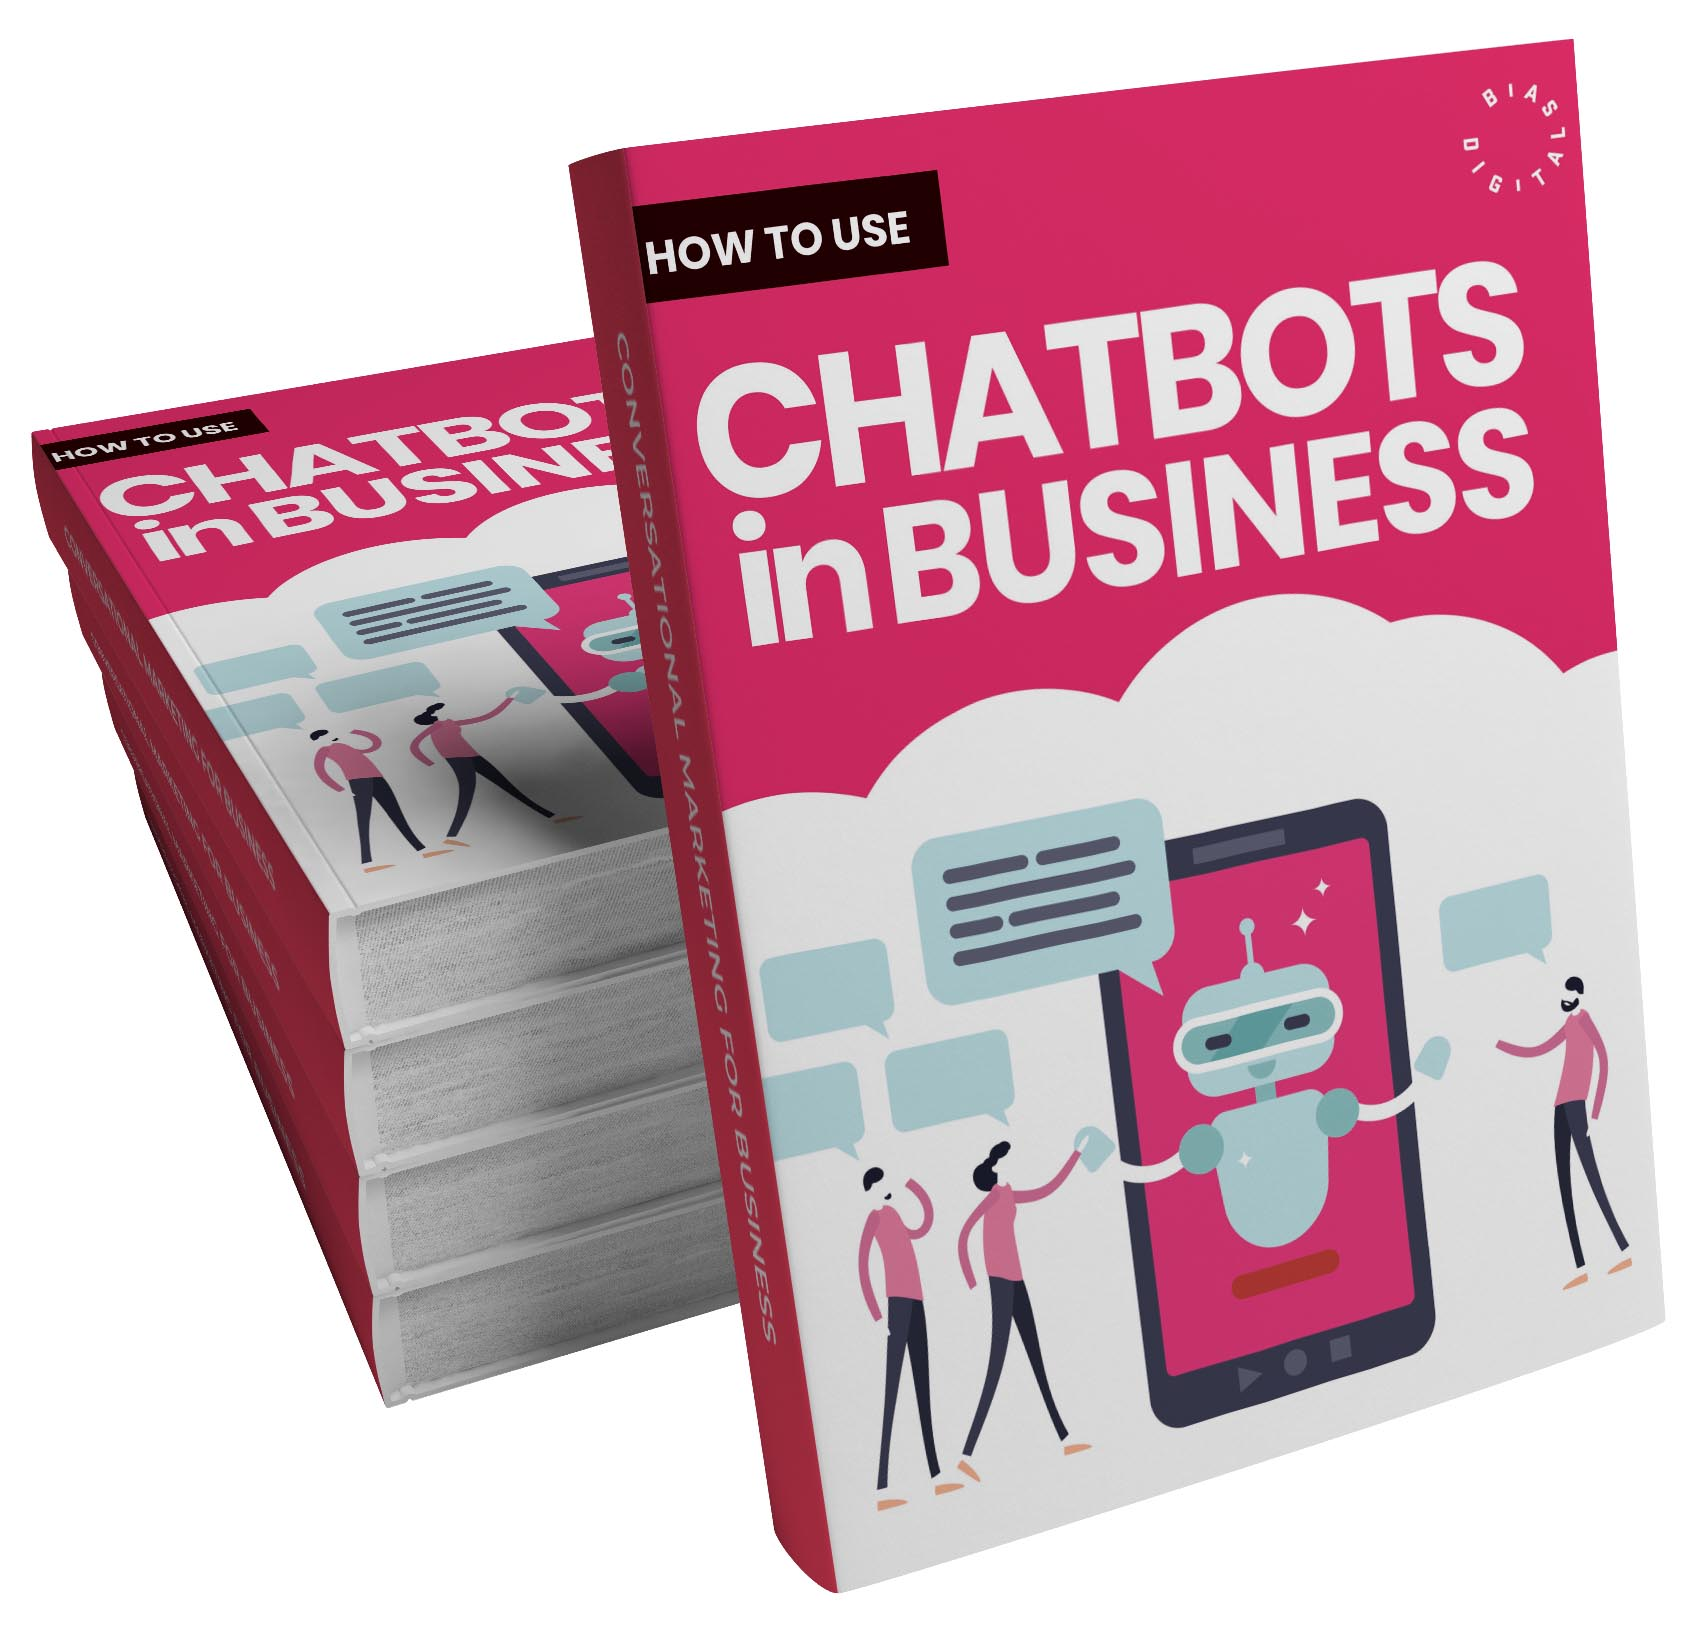 conversational-marketing-for-business